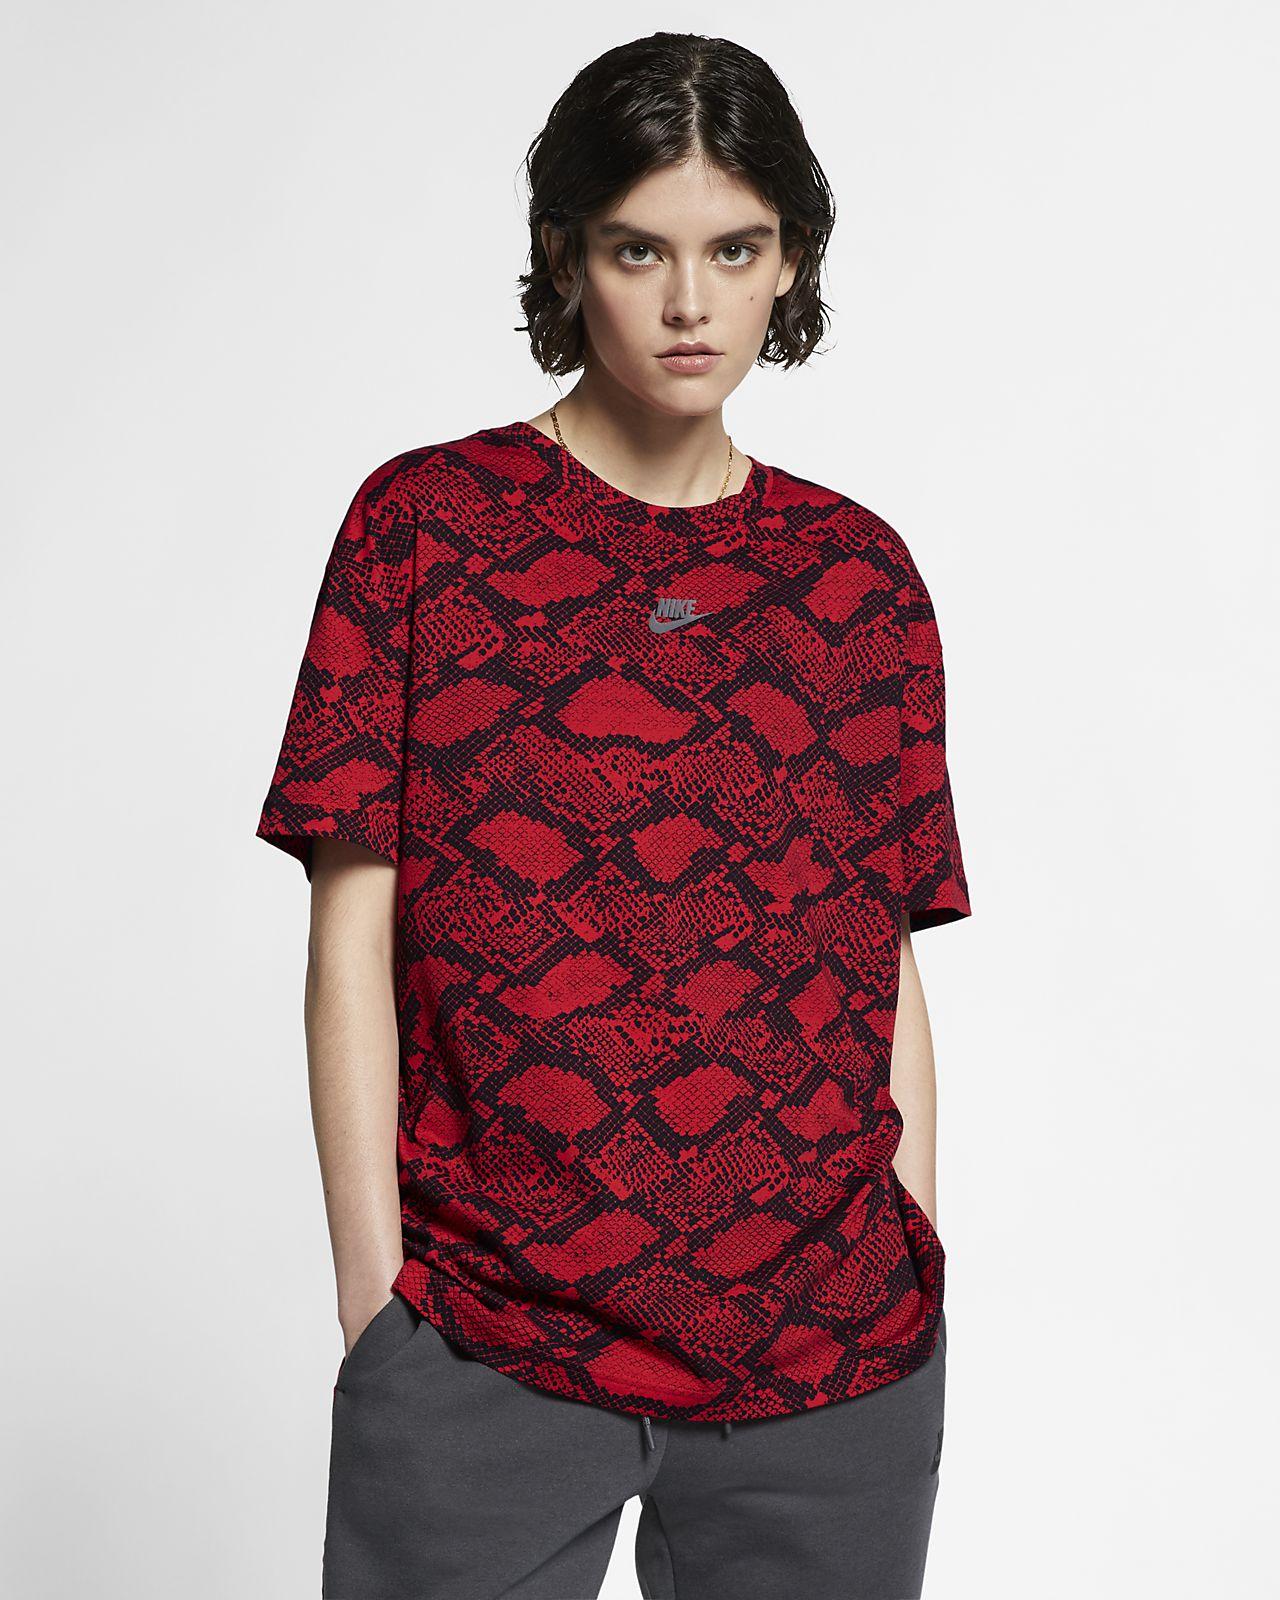 Nike Sportswear Camiseta con estampado animal - Mujer